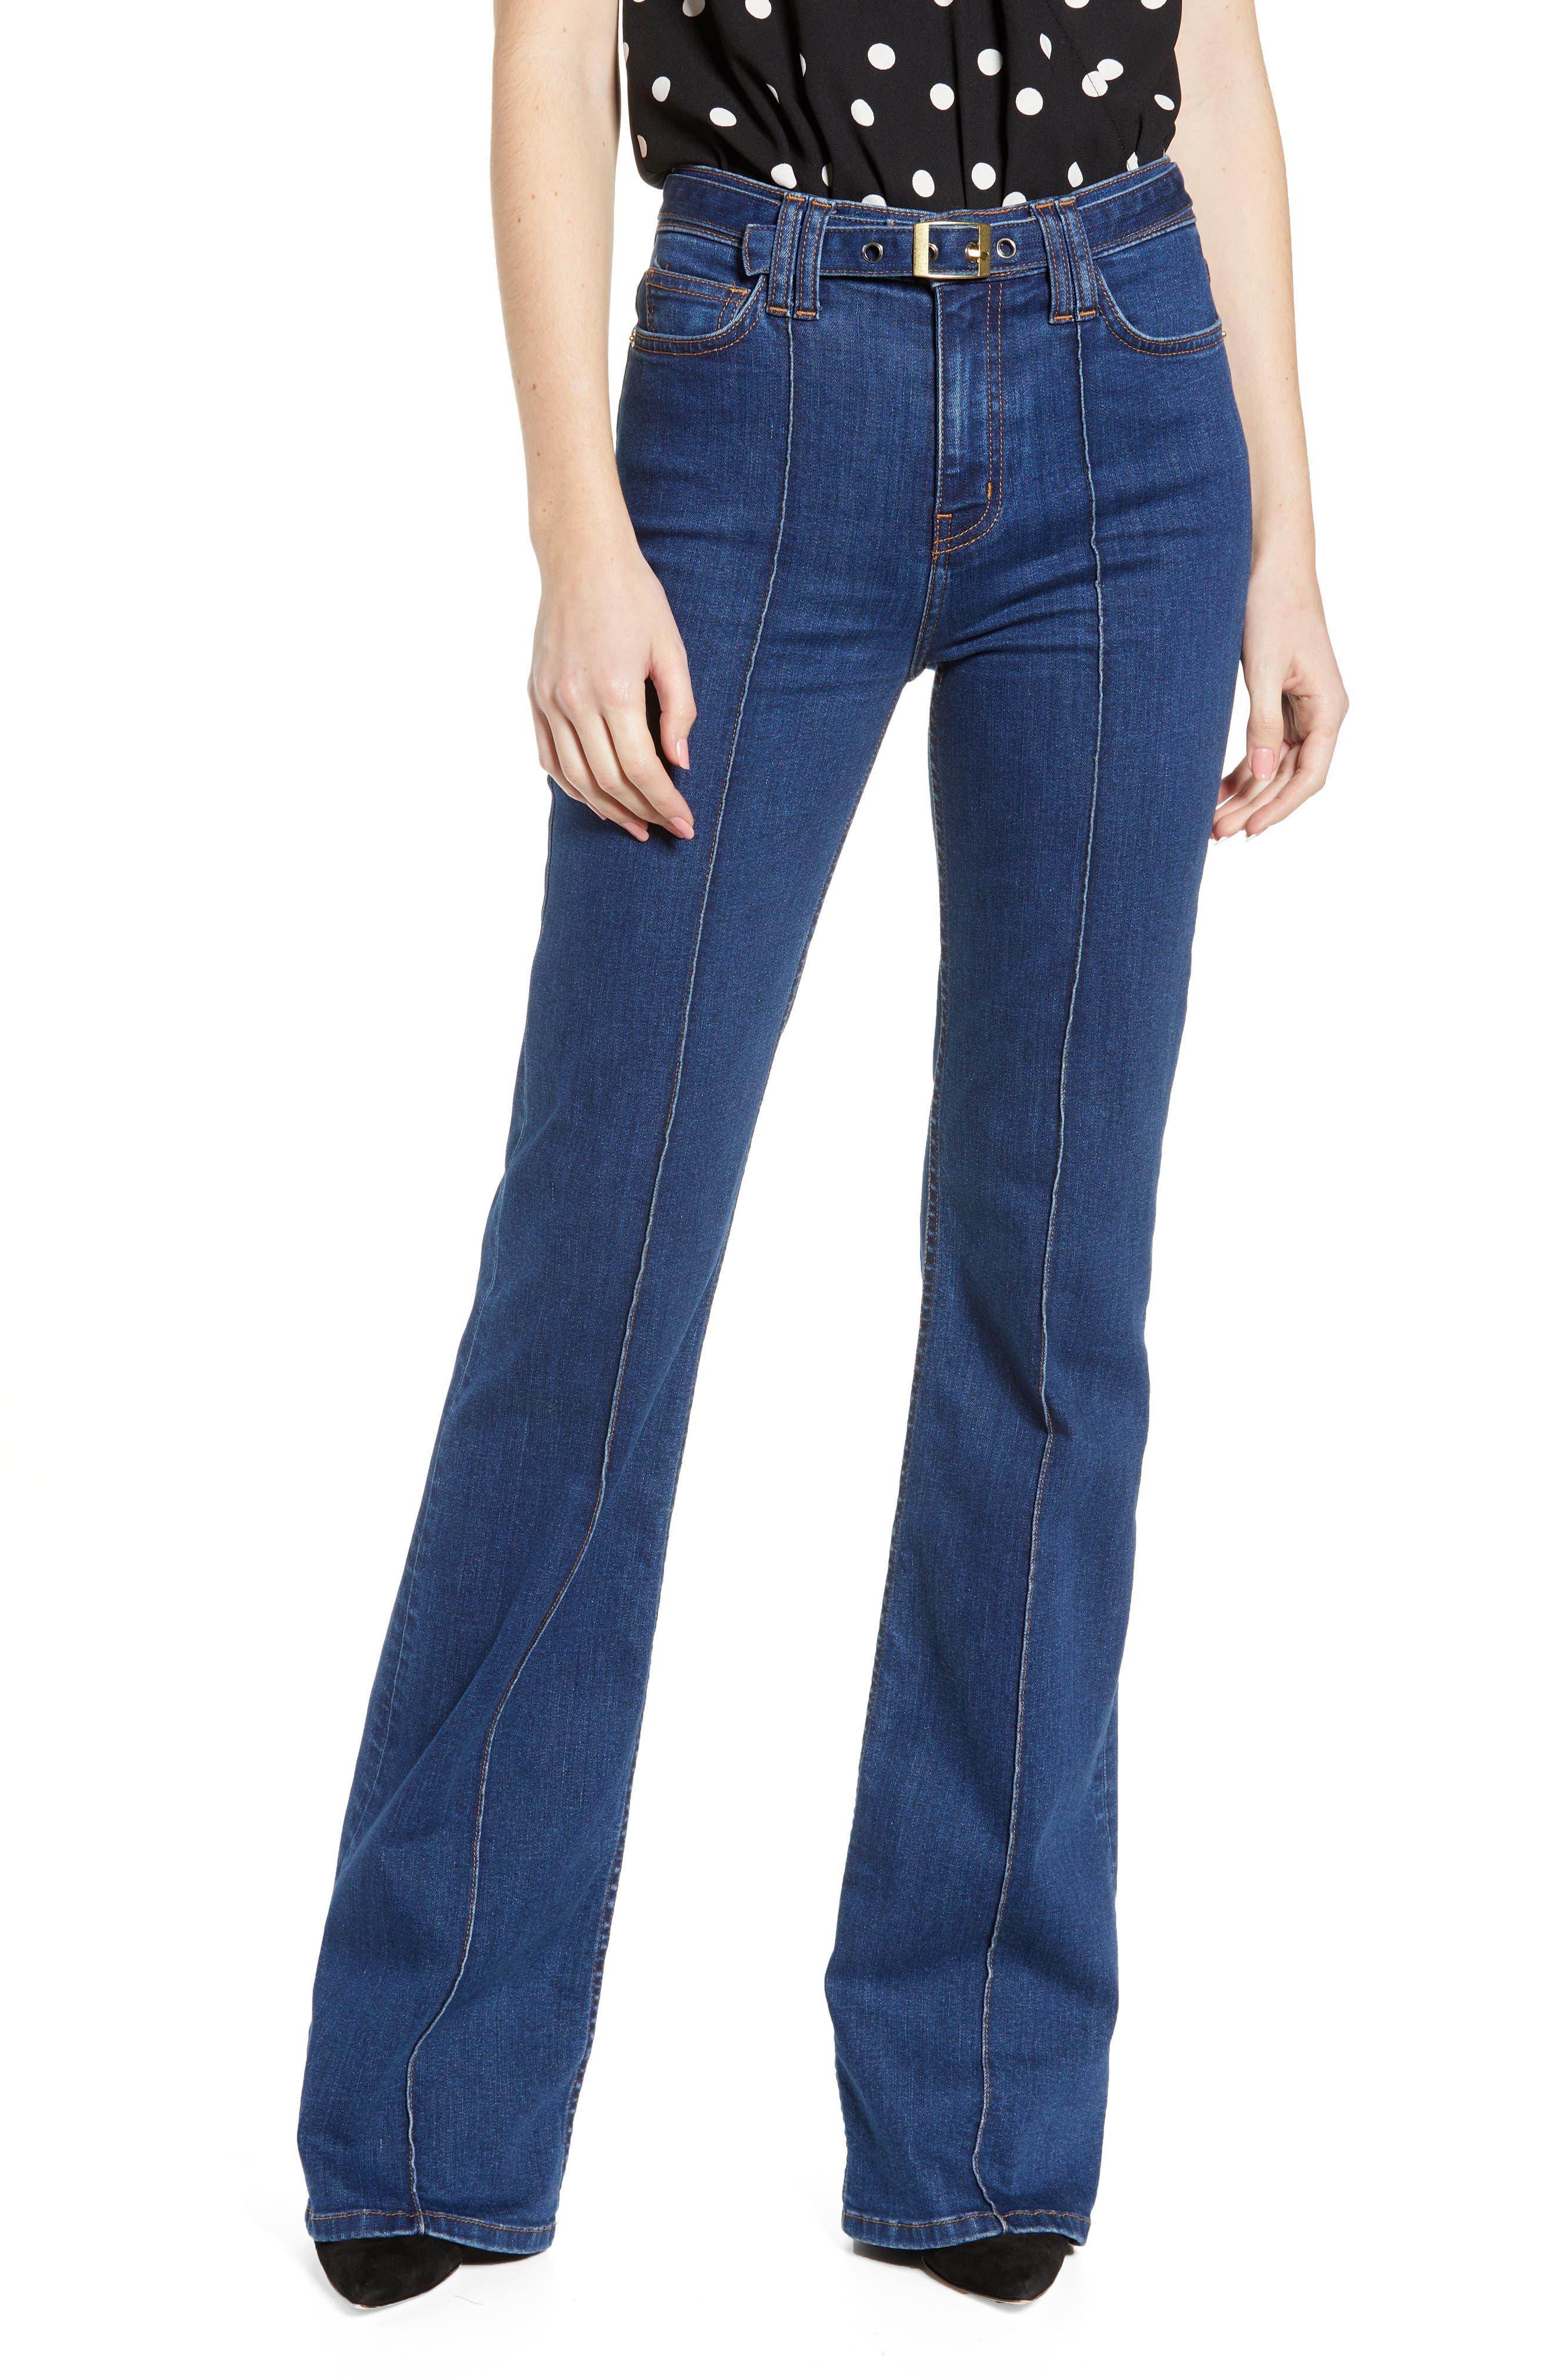 6f97dbd265 Women s Current Elliott Jeans   Denim